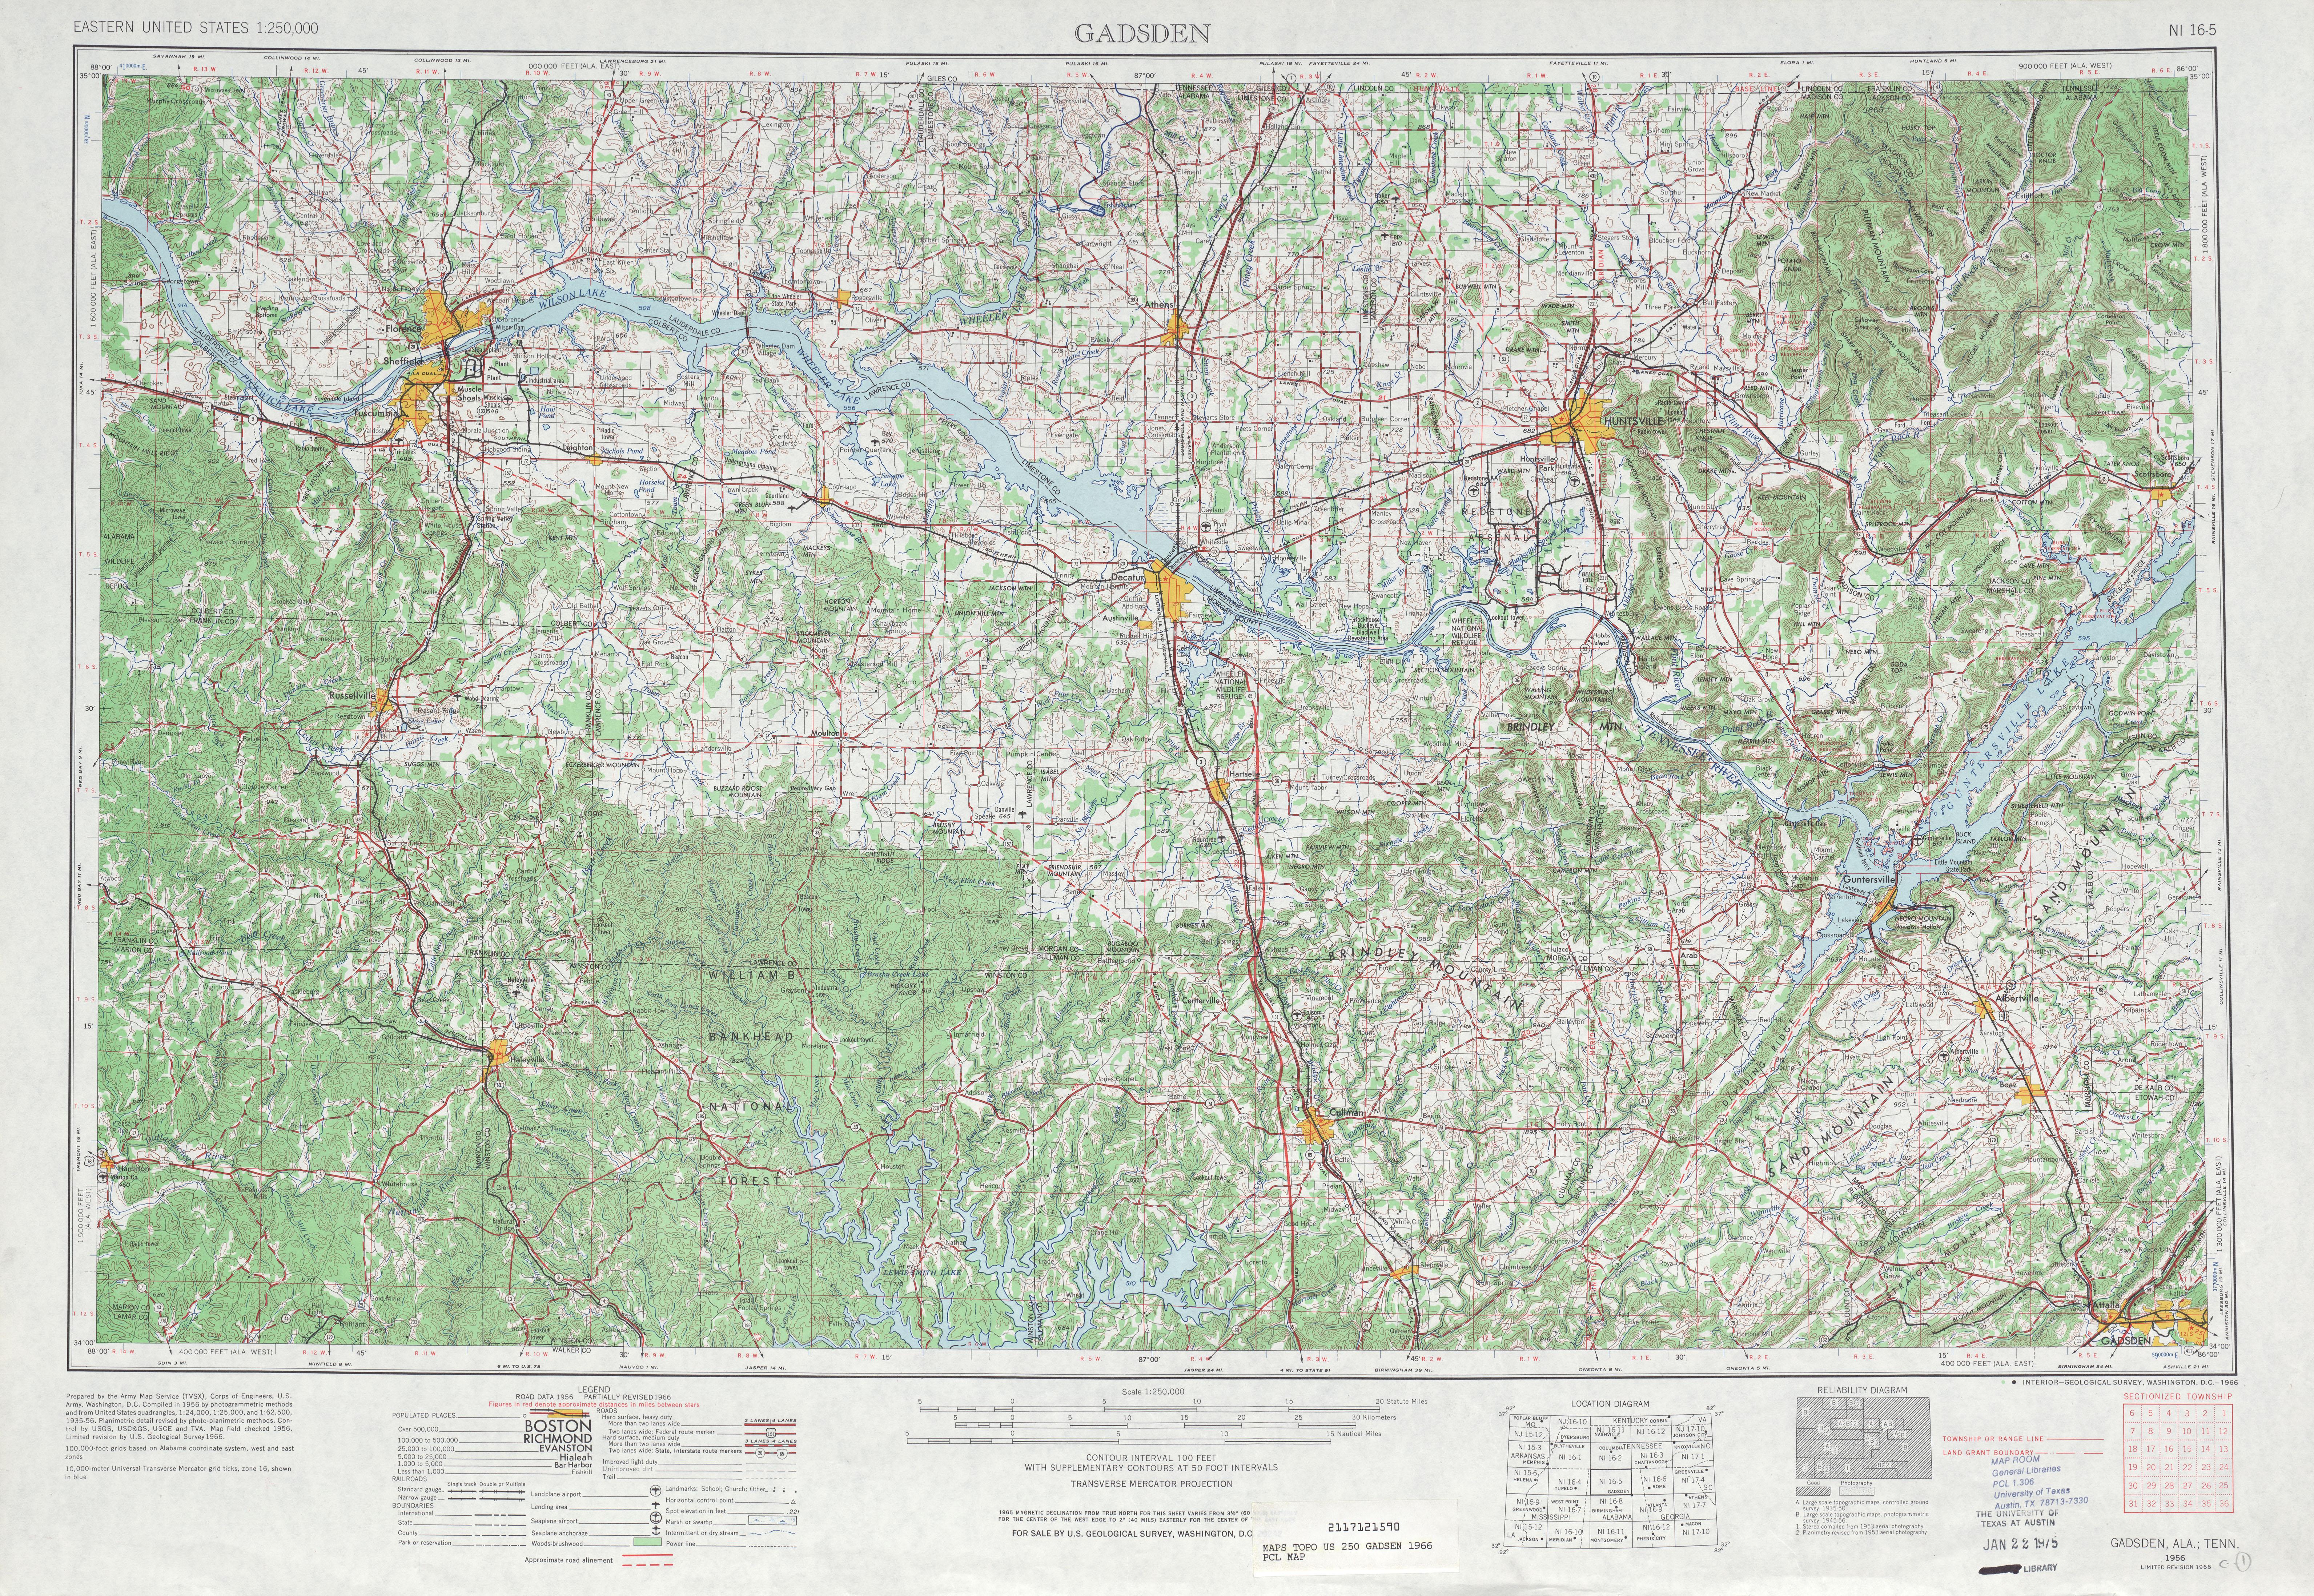 Gadsen Topographic Map Sheet, United States 1966